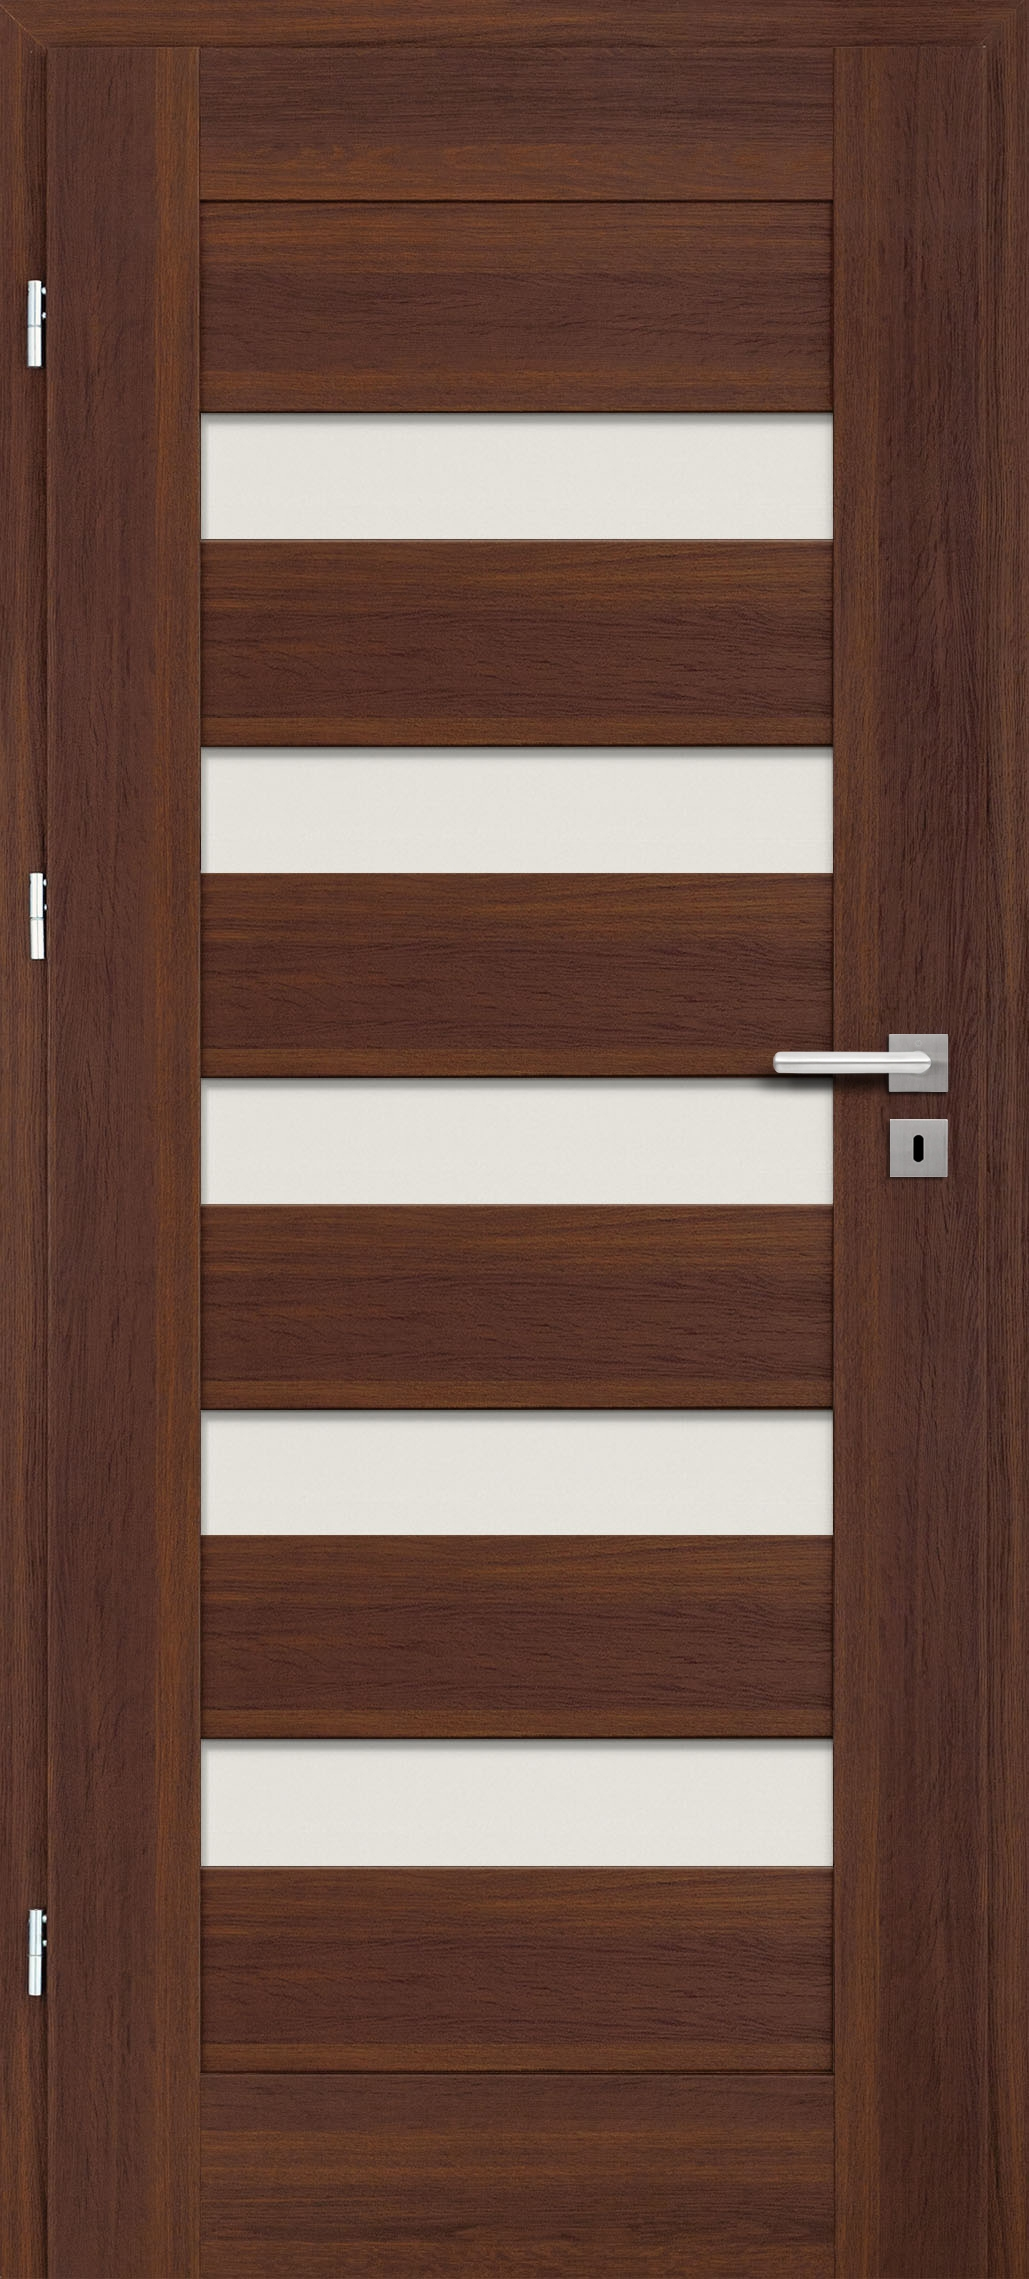 Interiérové dveře Erkado Magnólie